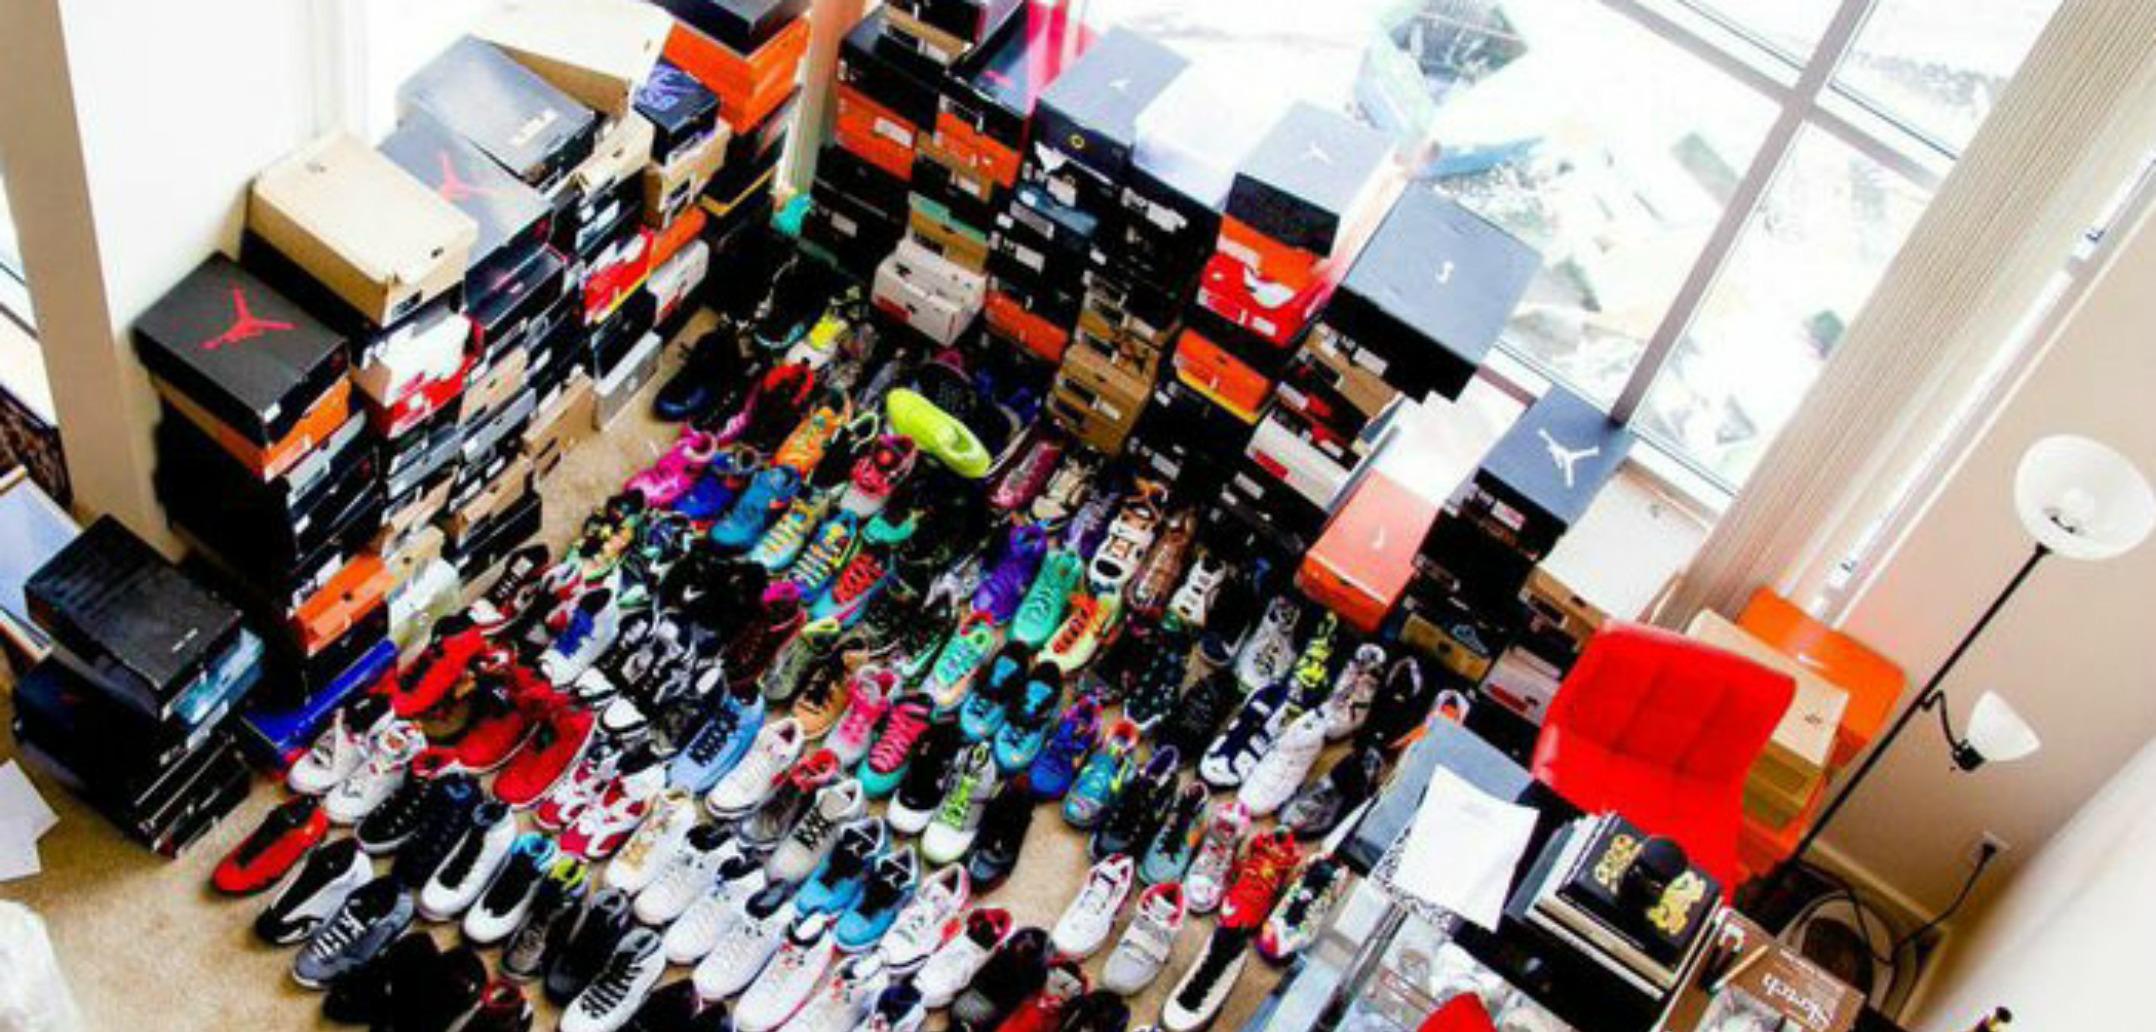 Browns Joe Haden Opening Sneaker Store To Debut On Black Friday